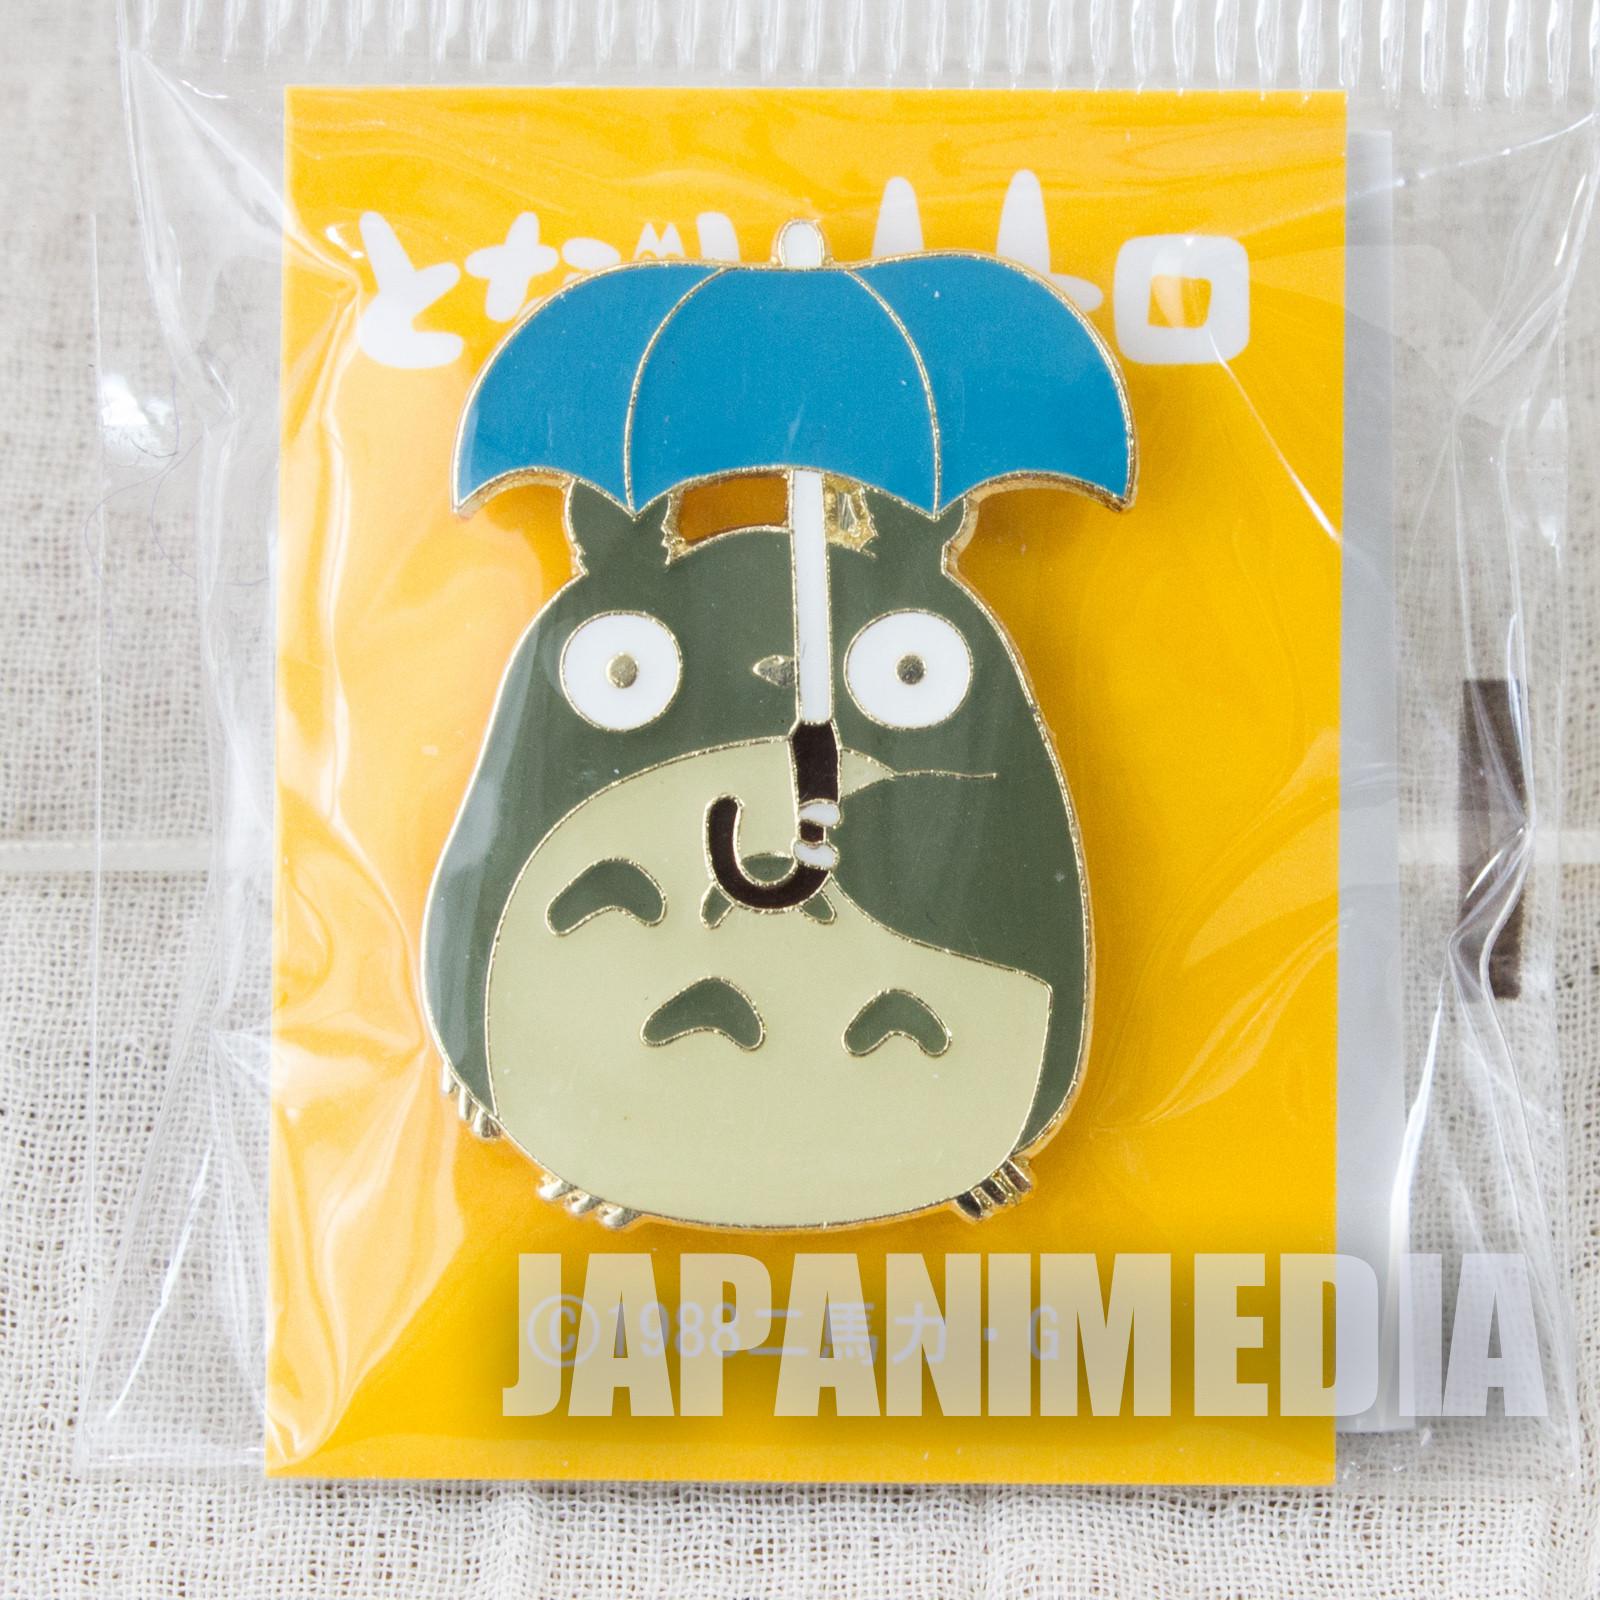 My Neighbor Totoro Pins #9 Ghibli Hayao Miyazaki JAPAN ANIME MANGA